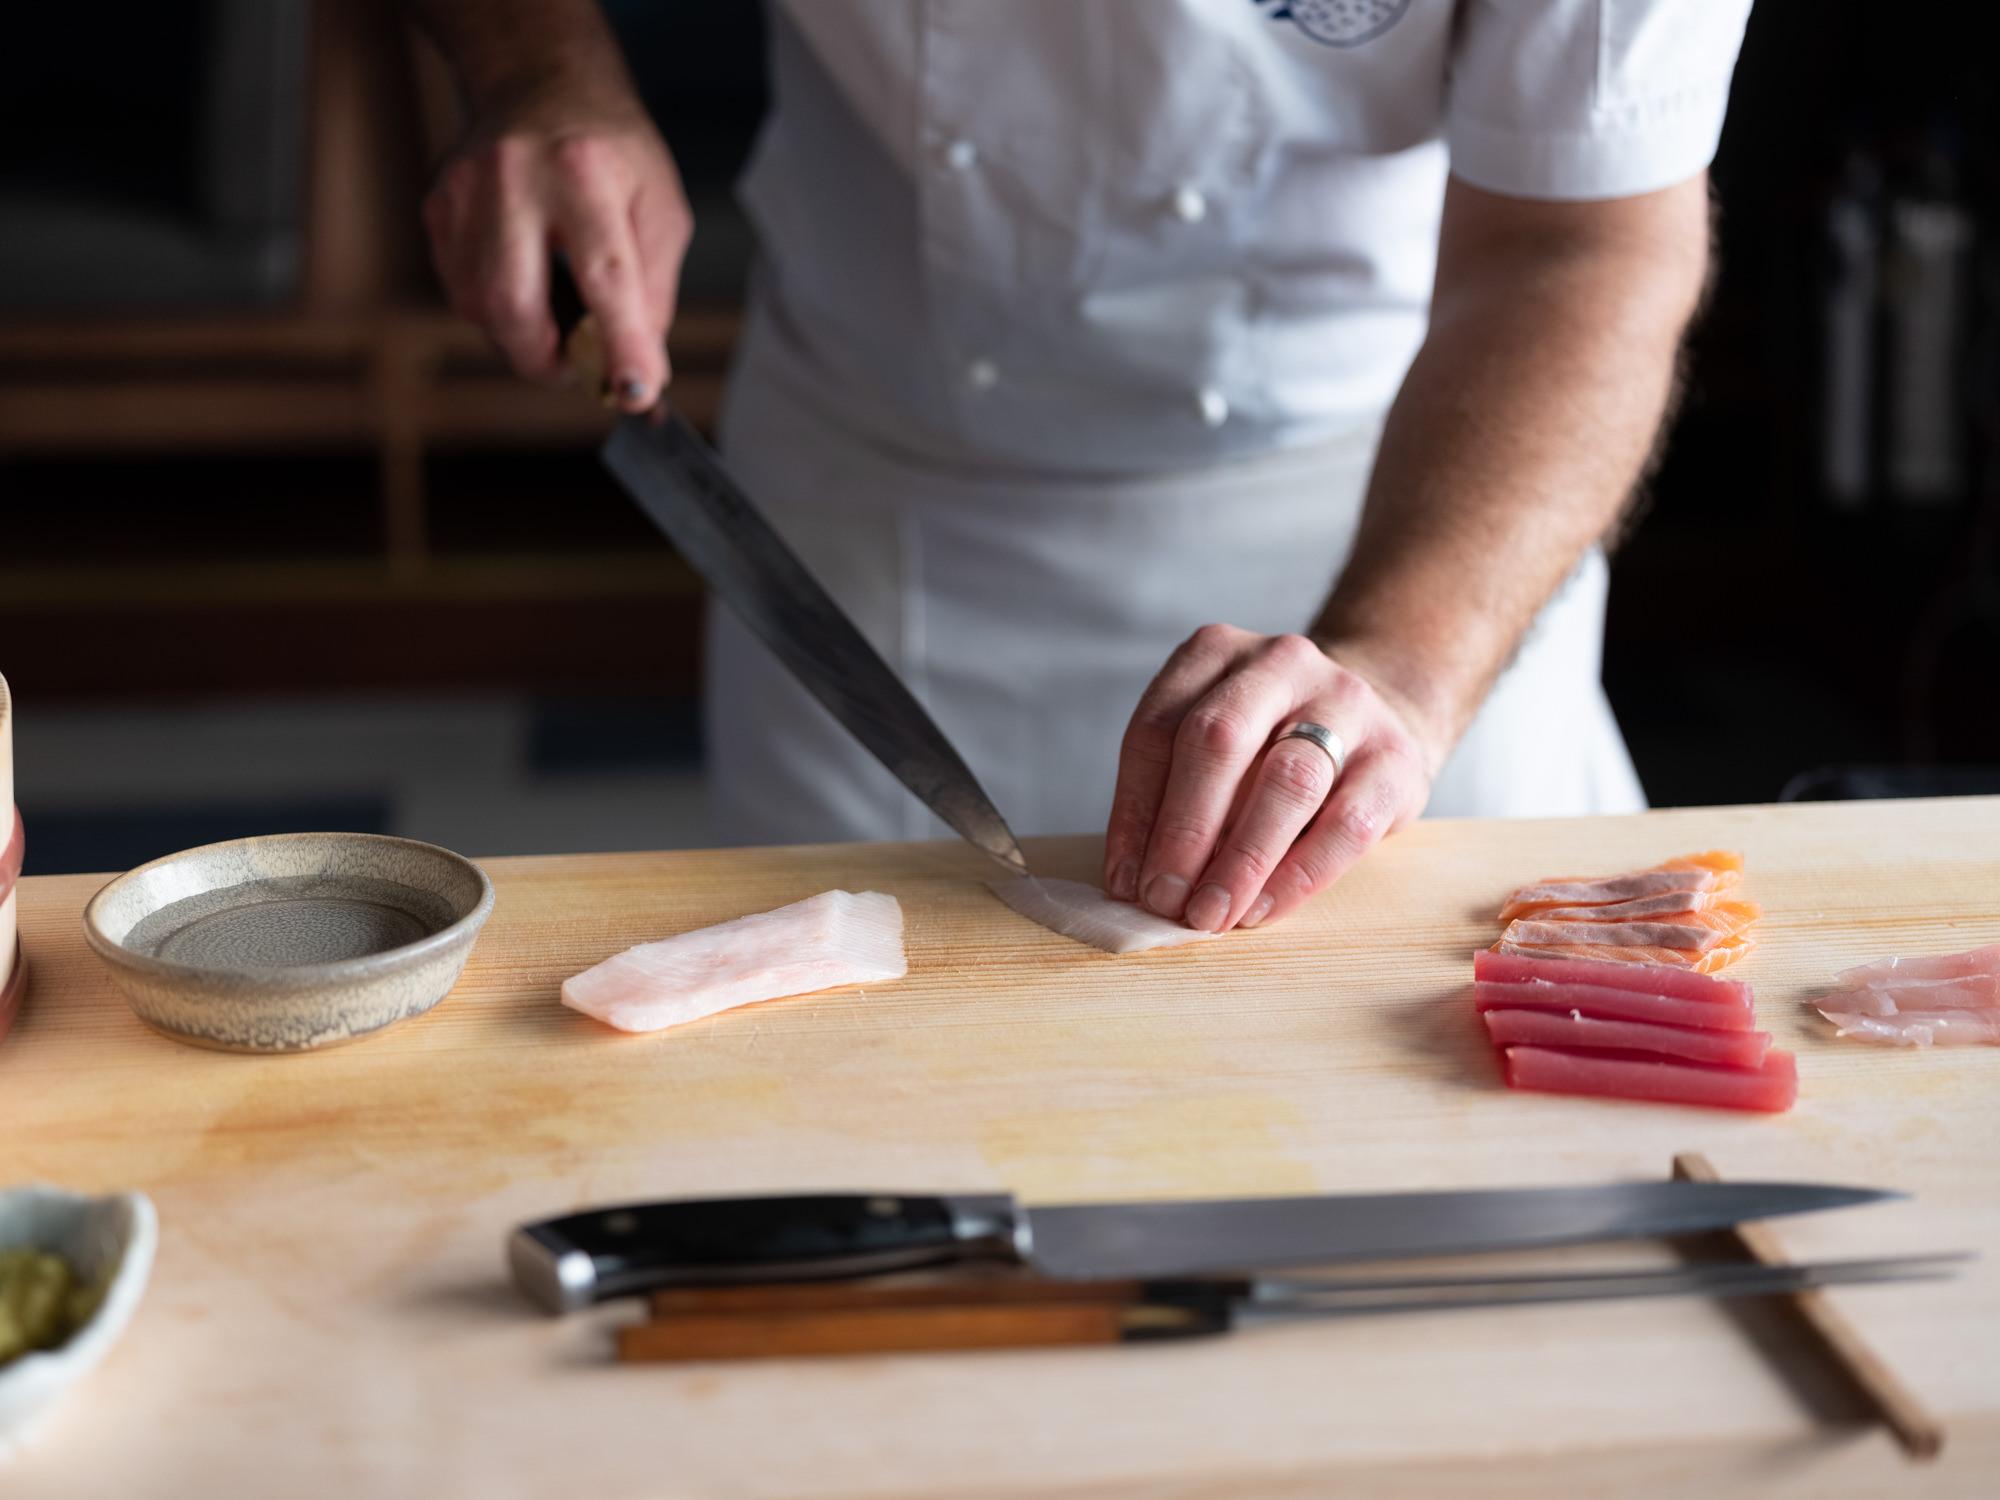 Australian Shuan Presland cuts raw fish. He will open Pacific at number 10 Heddon Street in Mayfair in November 2019